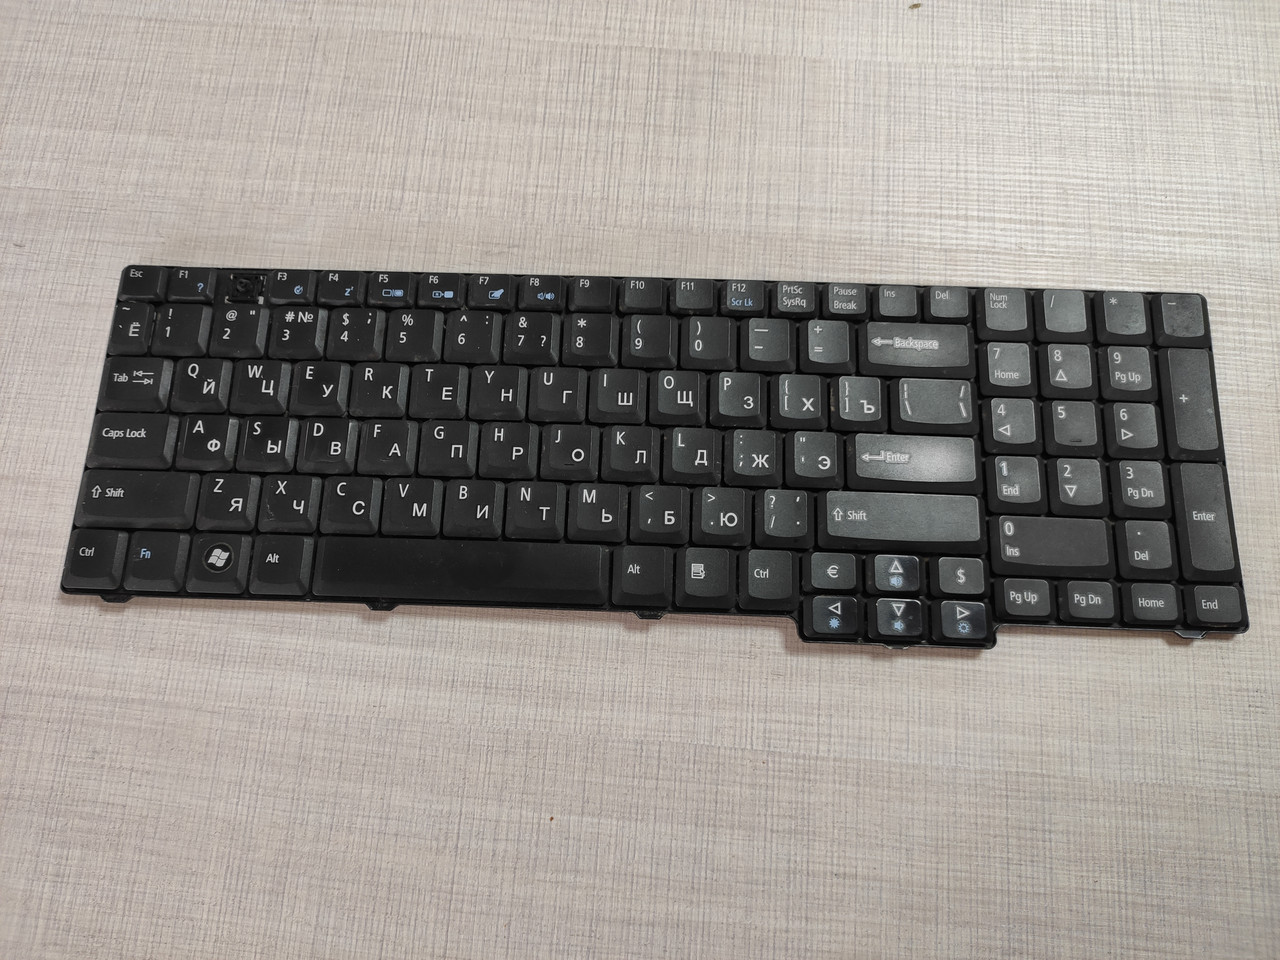 Клавиатура б\у Aсer 7620, 7620G, 7620Z, 7630 NSK-AFE0R